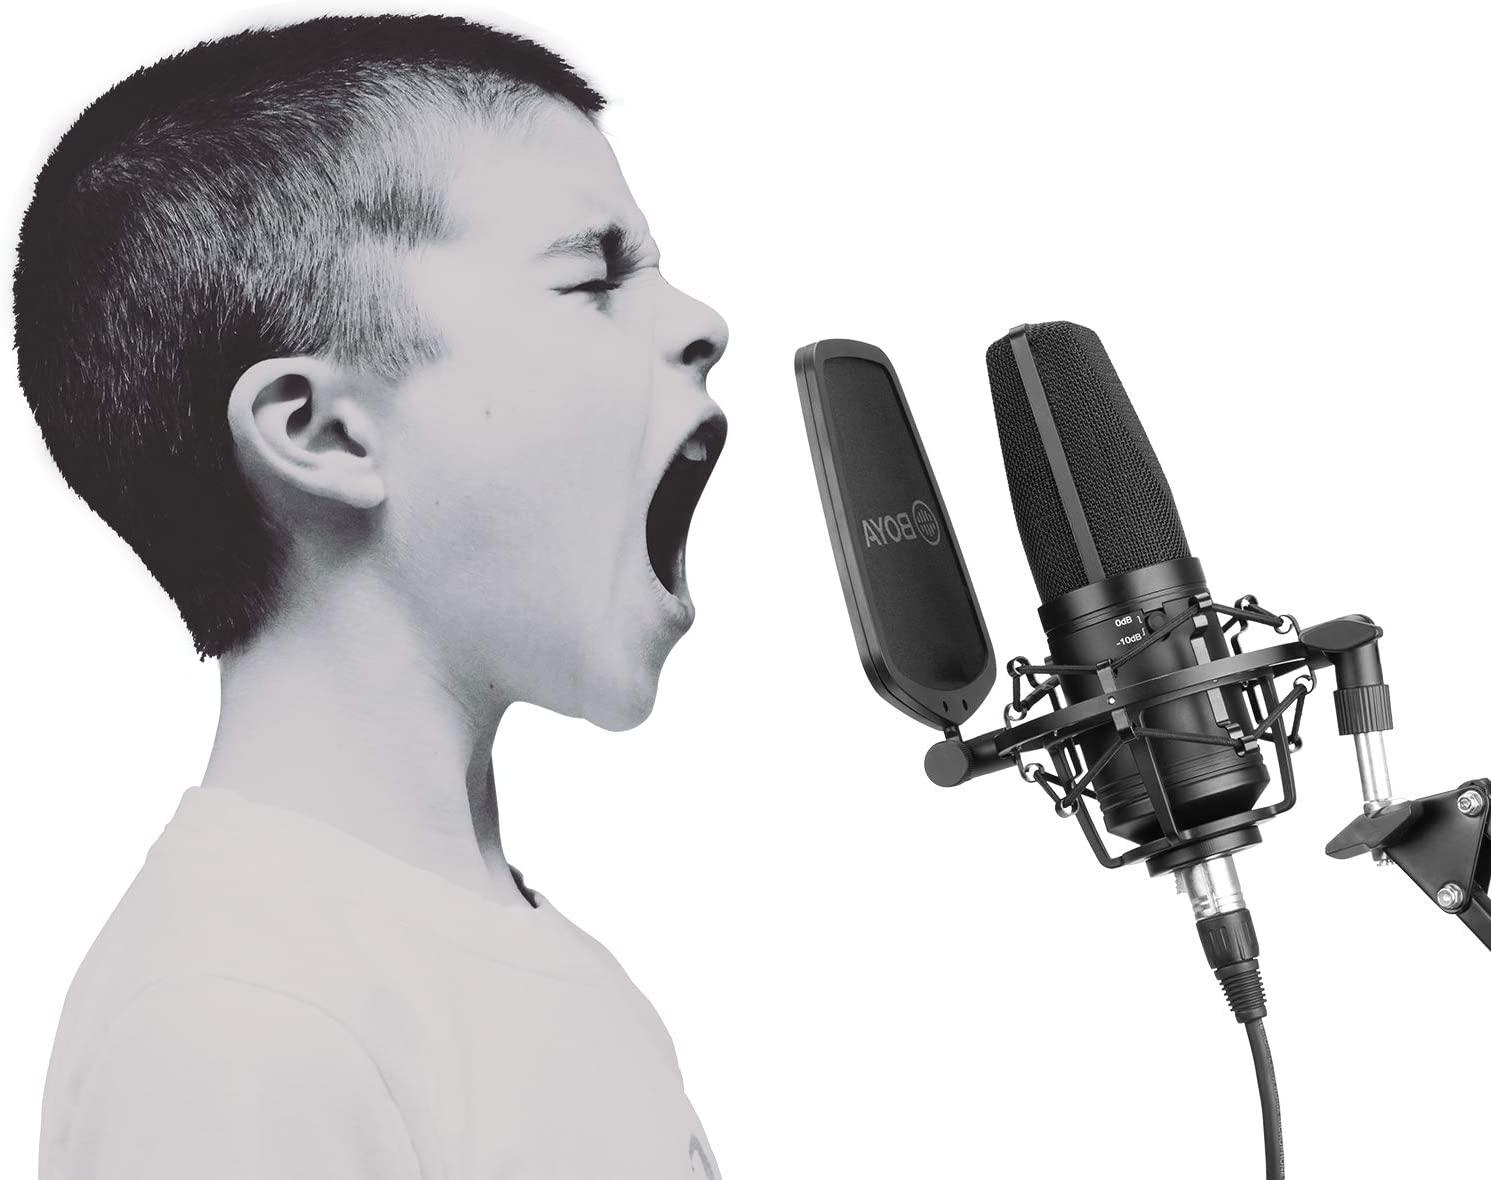 BOYA Large Diaphragm Studio Condenser Microphone 24V 48V Phantom Power Sturdy Housing for Vocal Recording Podcasting Broadcasting